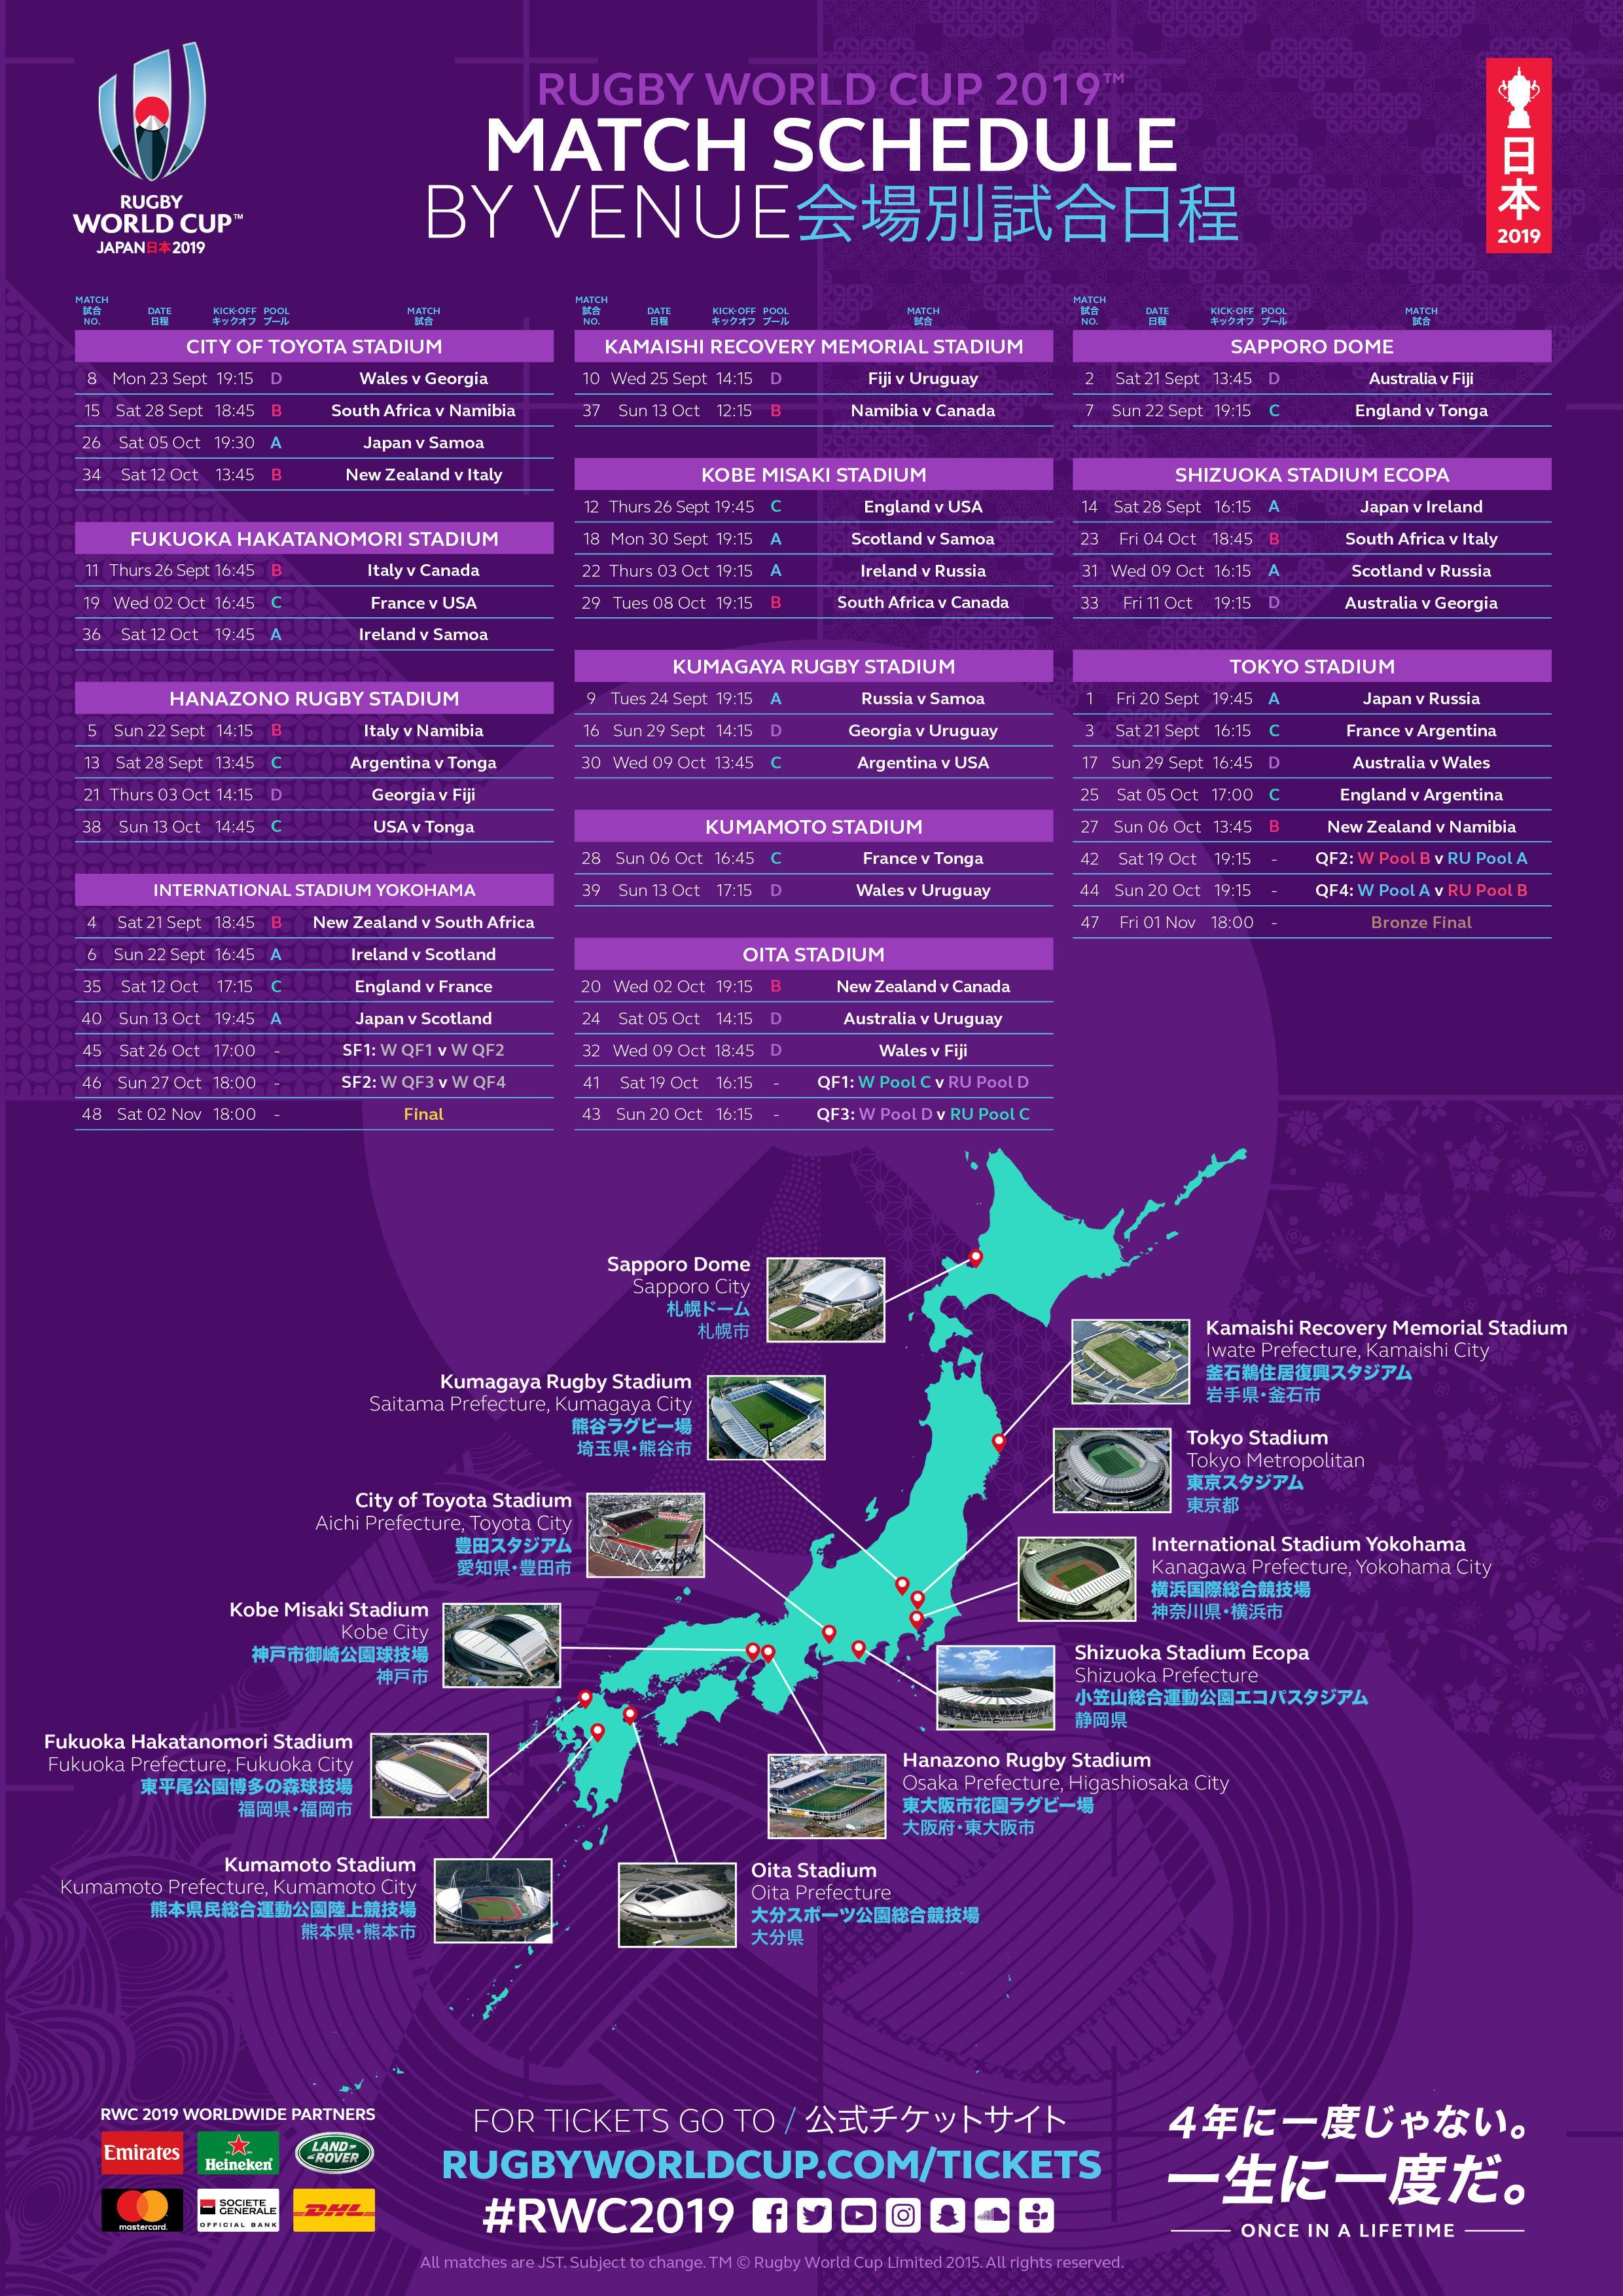 RWC 2019 Match Schedule - Rugby World Cup 2019 ...